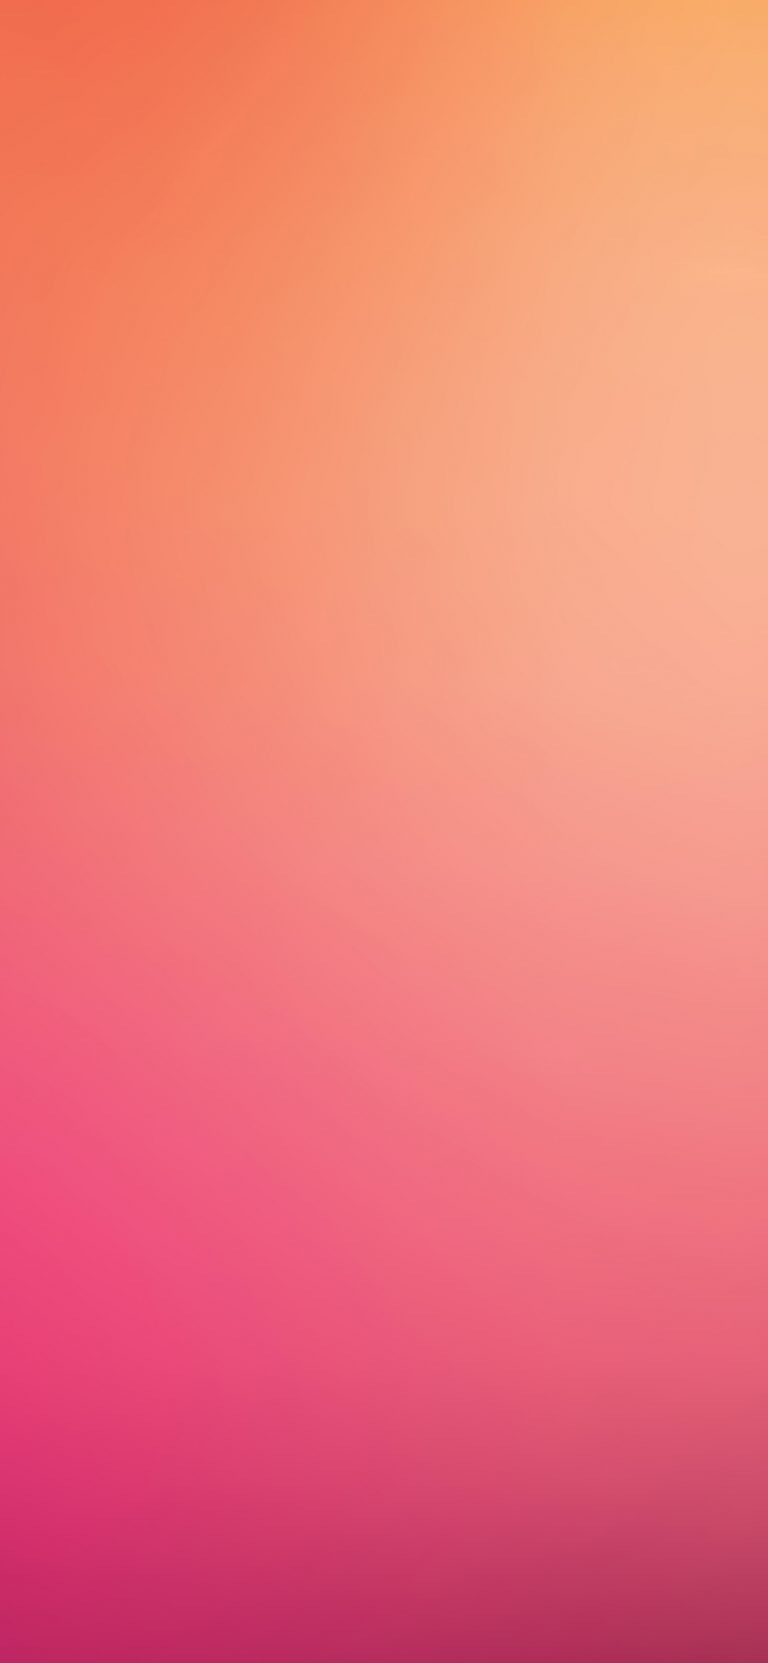 Meizu M6s Stock Wallpapers 4 1125x2436